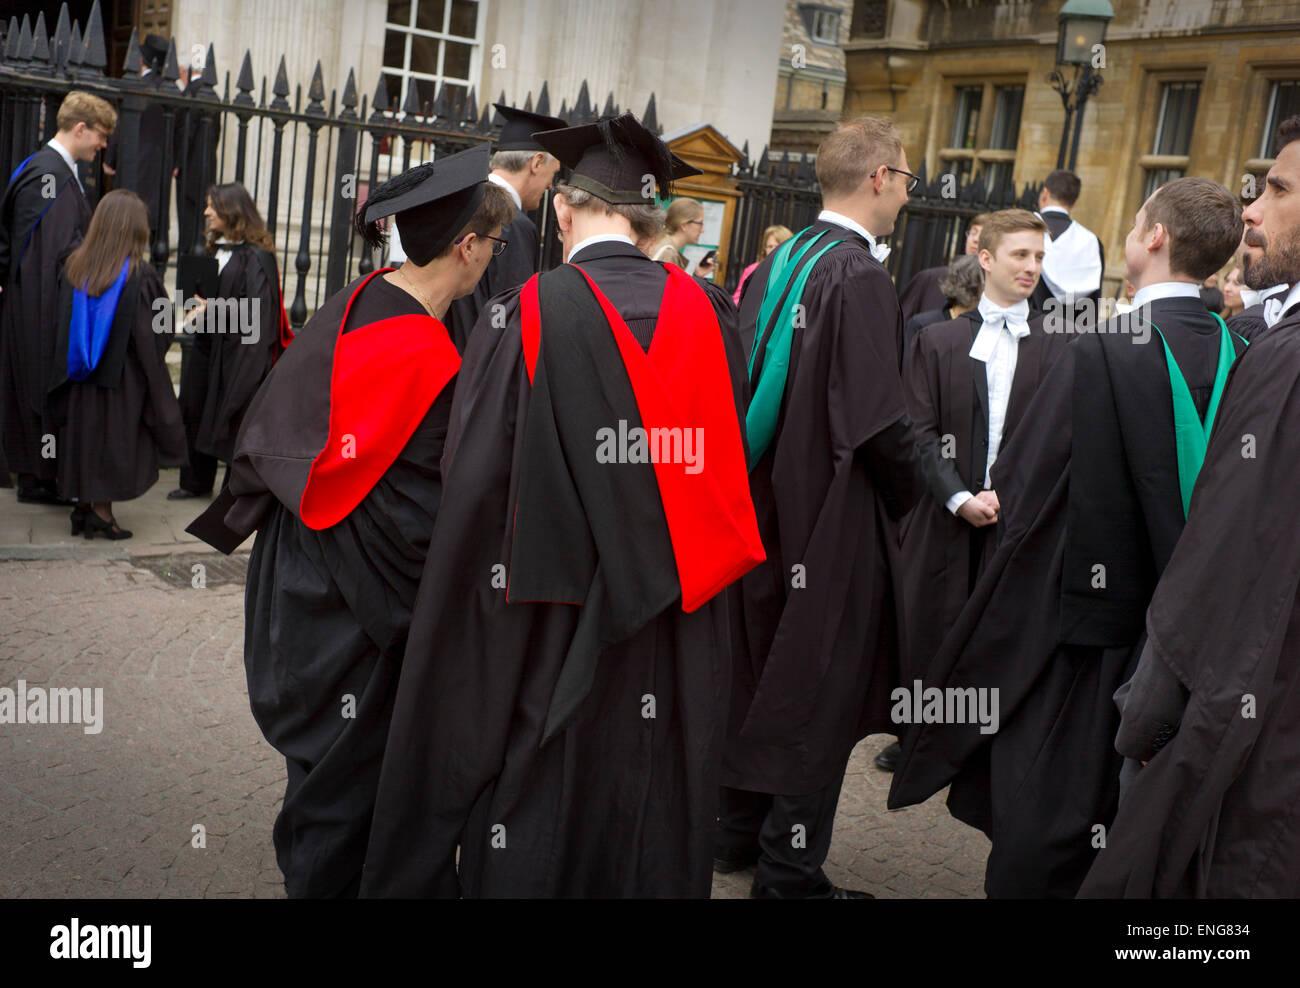 Cambridge University Students Graduation Ceremony at the Seante House, Cambridge, England, UK. April 2015 - Stock Image